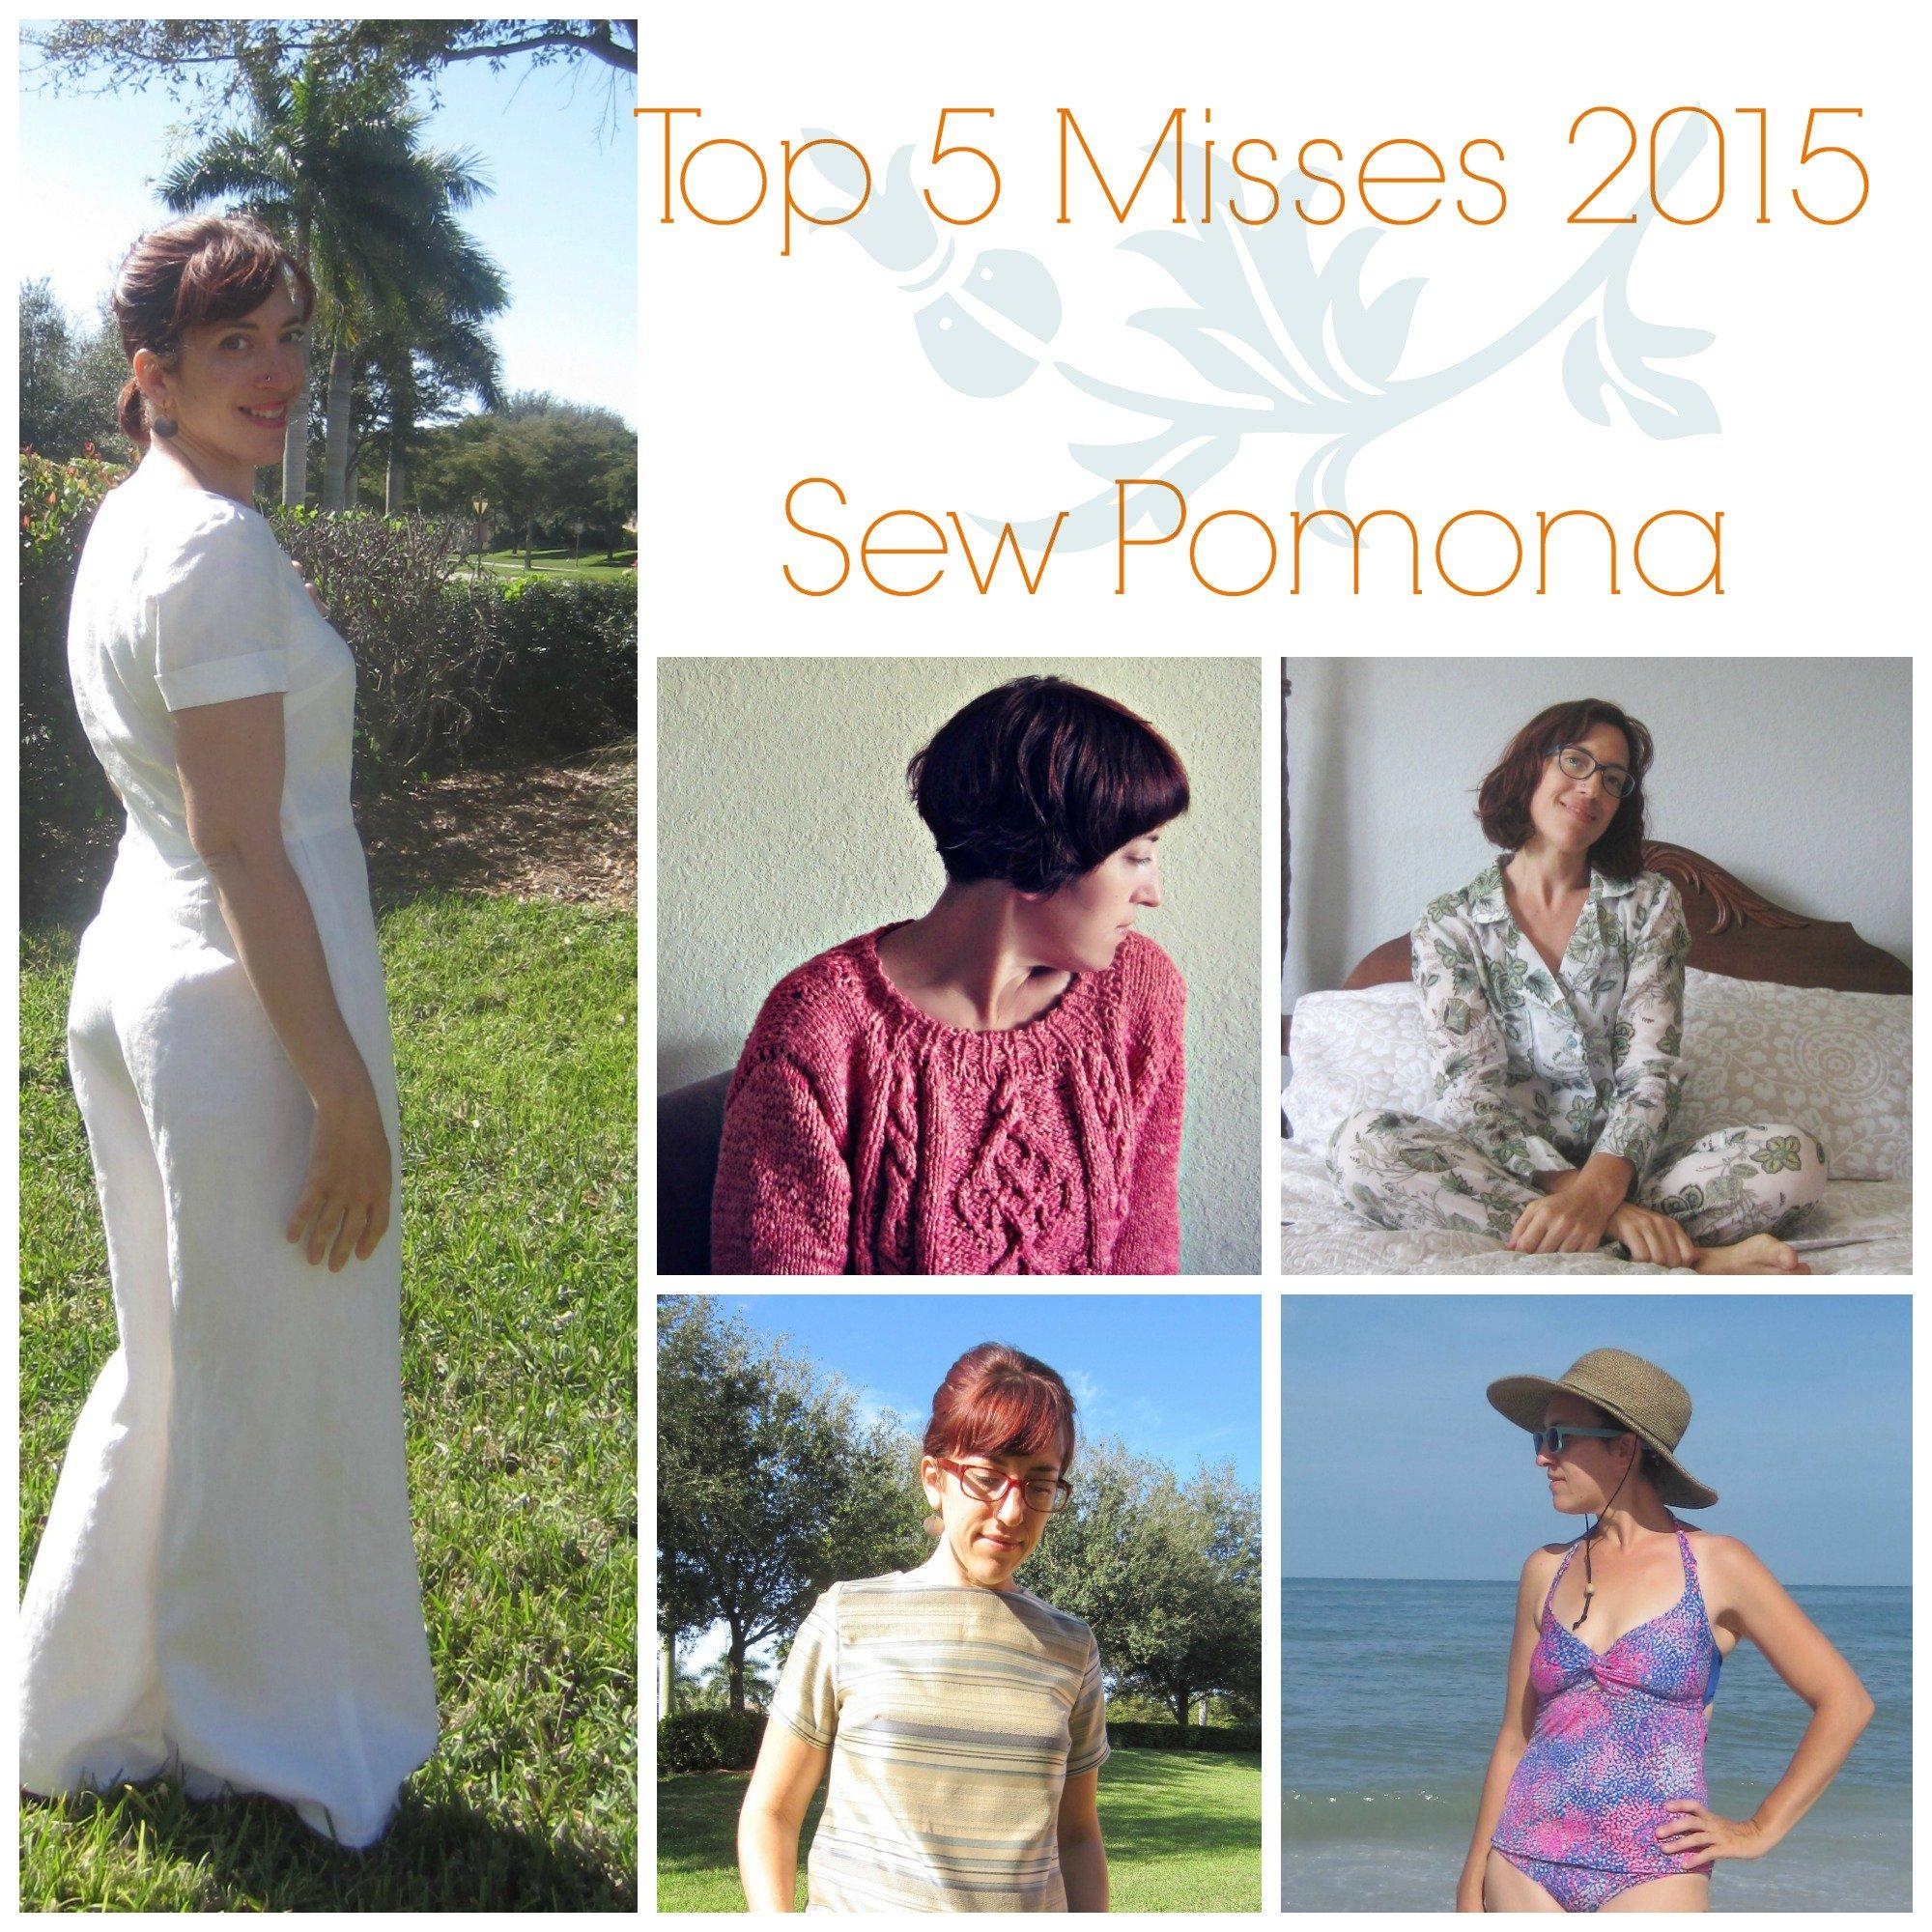 Top 5 Misses 2015